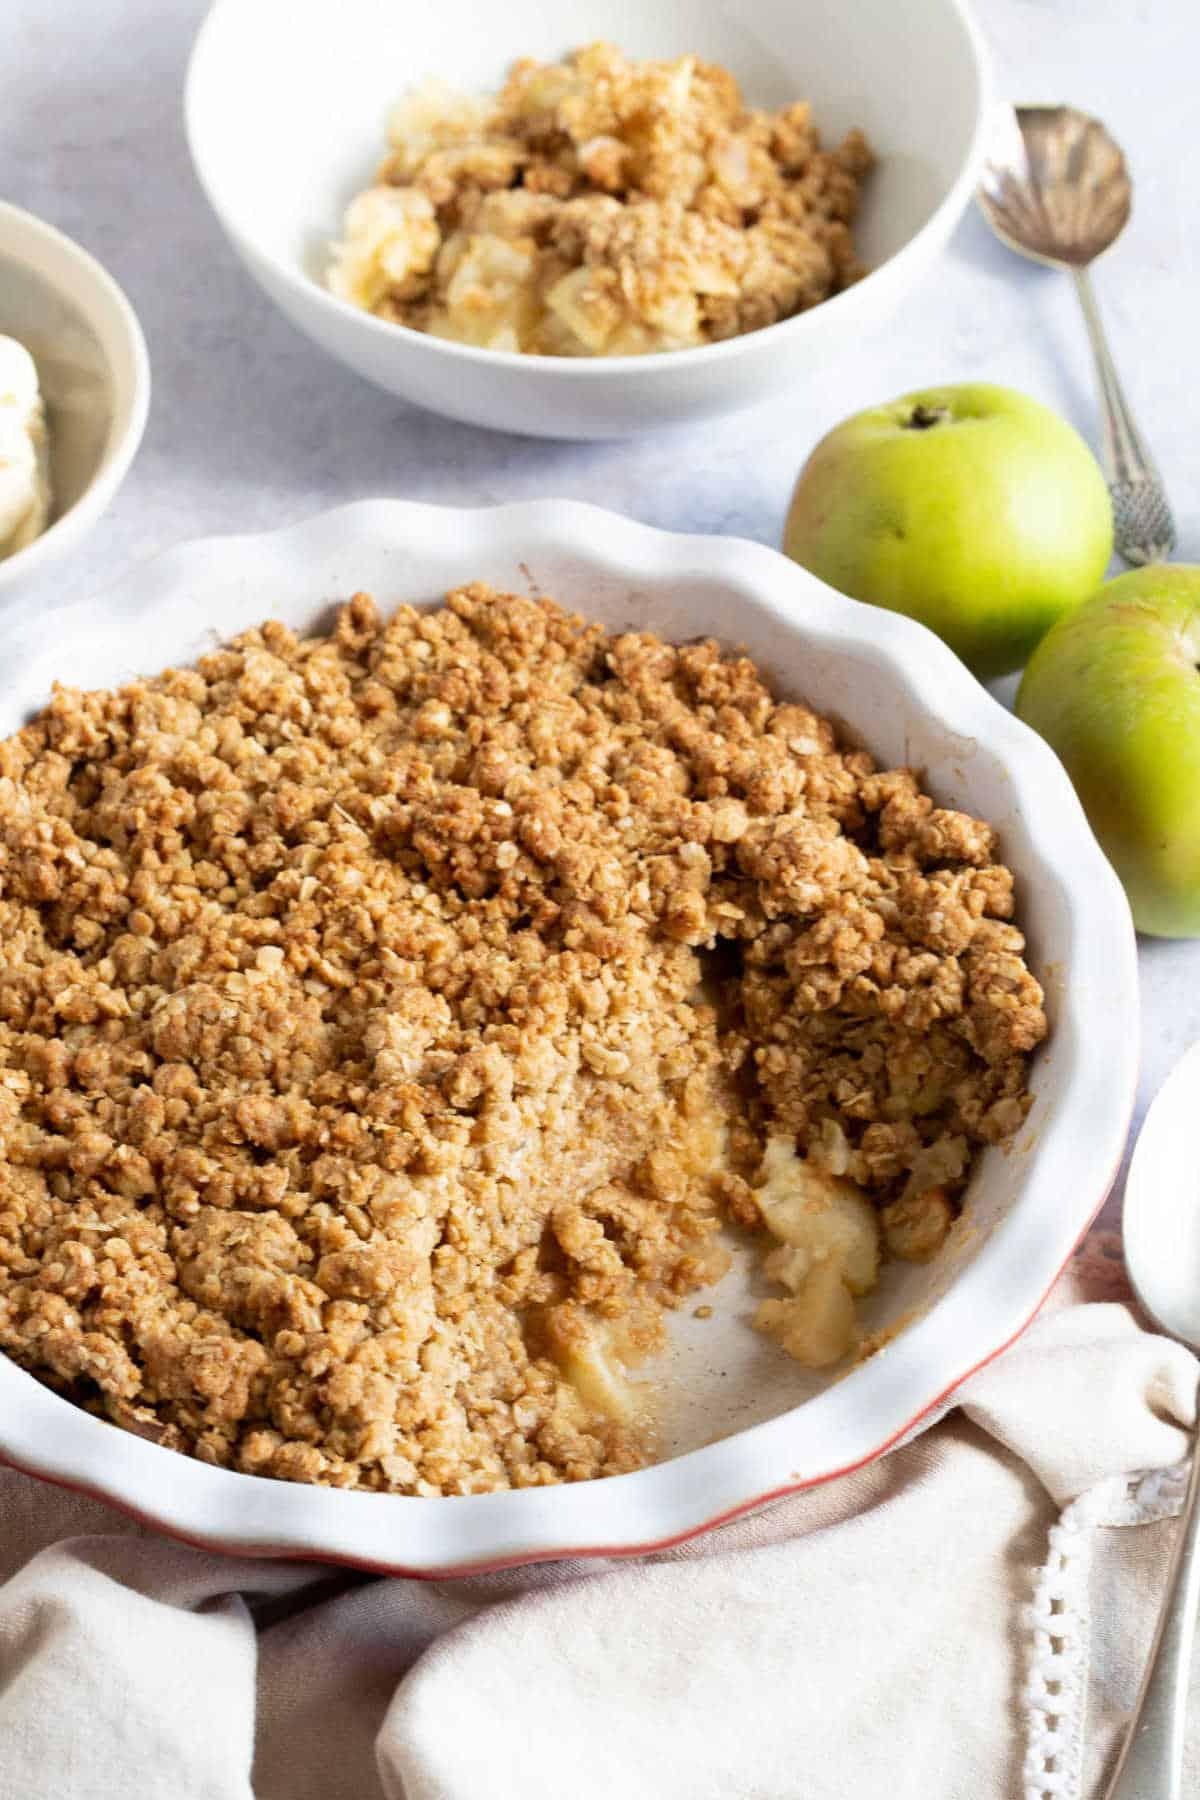 Cinnamon apple crumble in a pie dish.